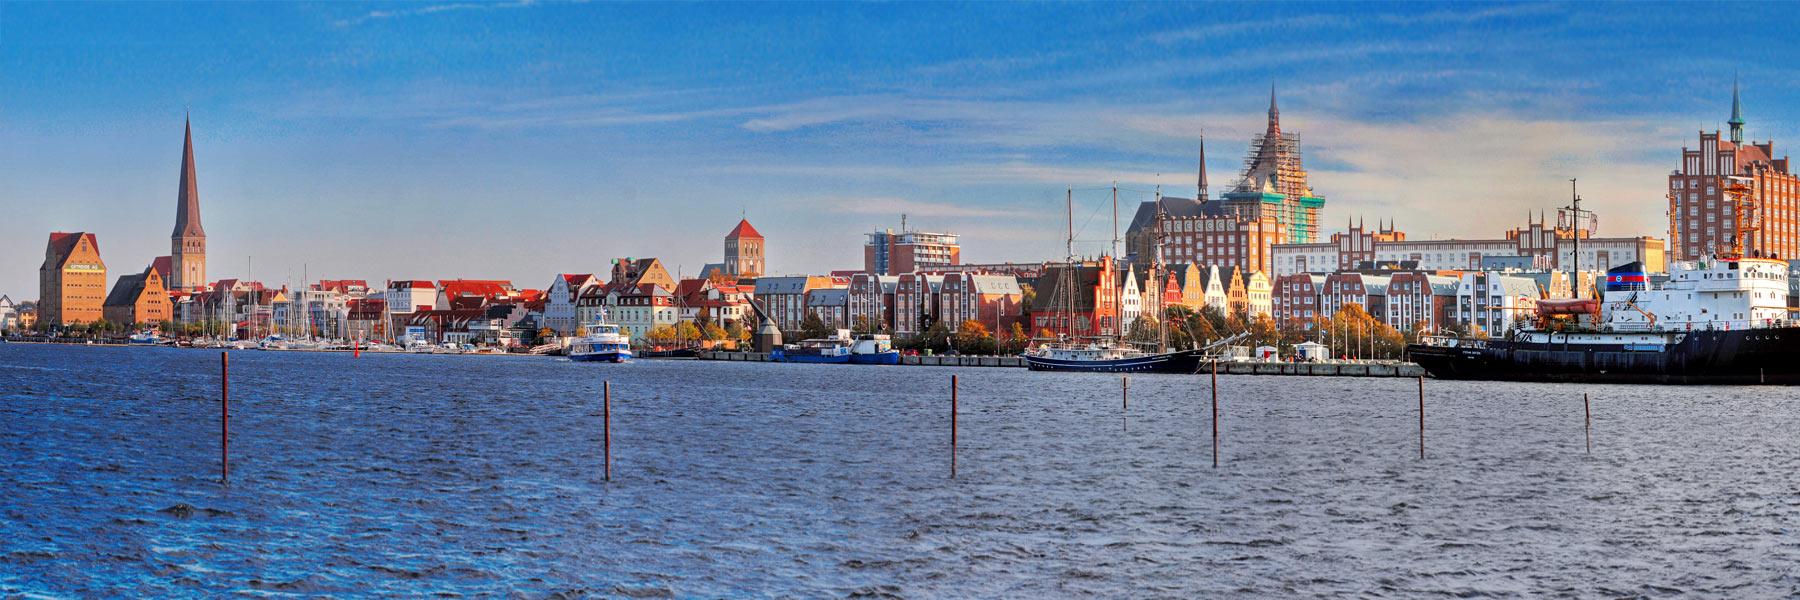 Stadthafen - Hansestadt Rostock